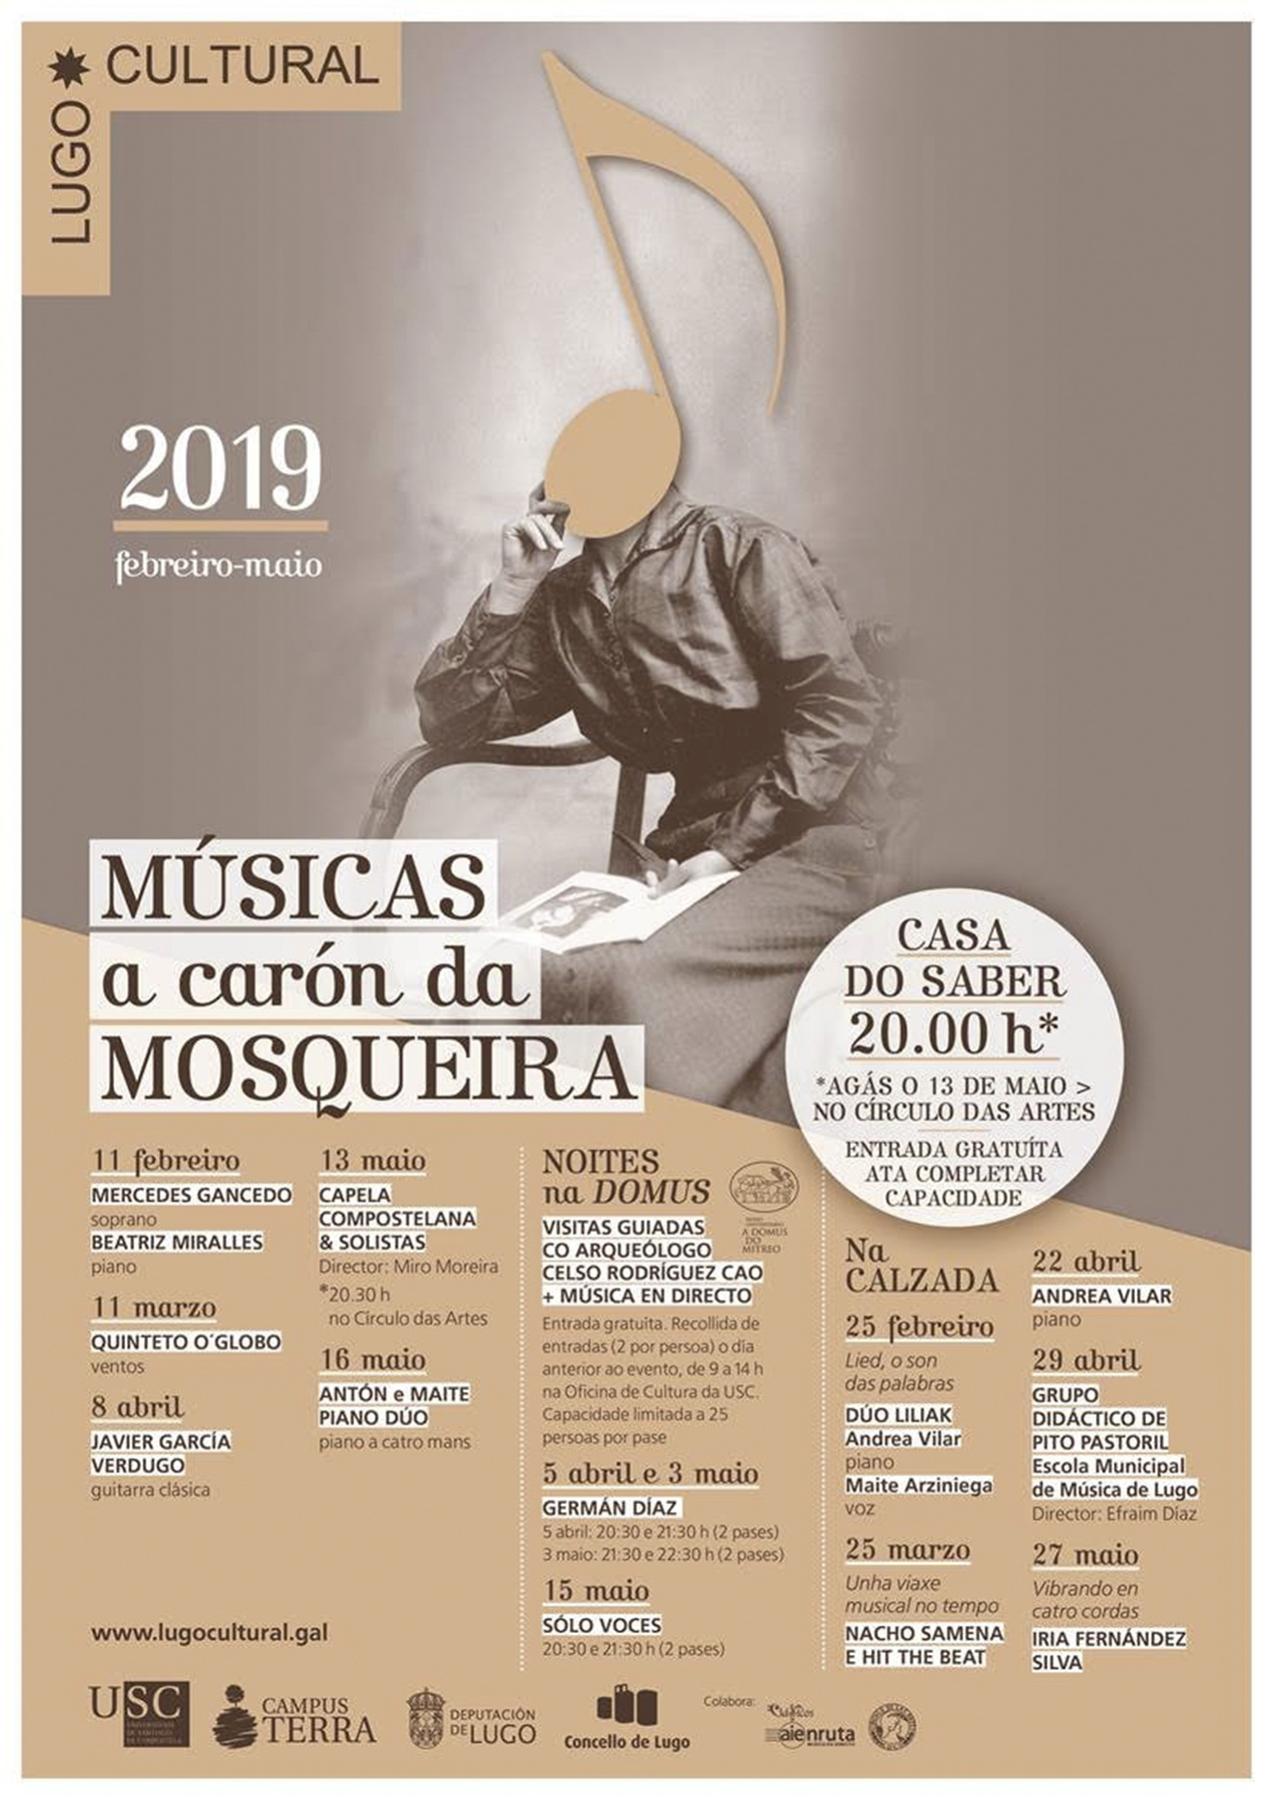 """Músicas ao carón da Mosqueira"" de Lugo Cultural"